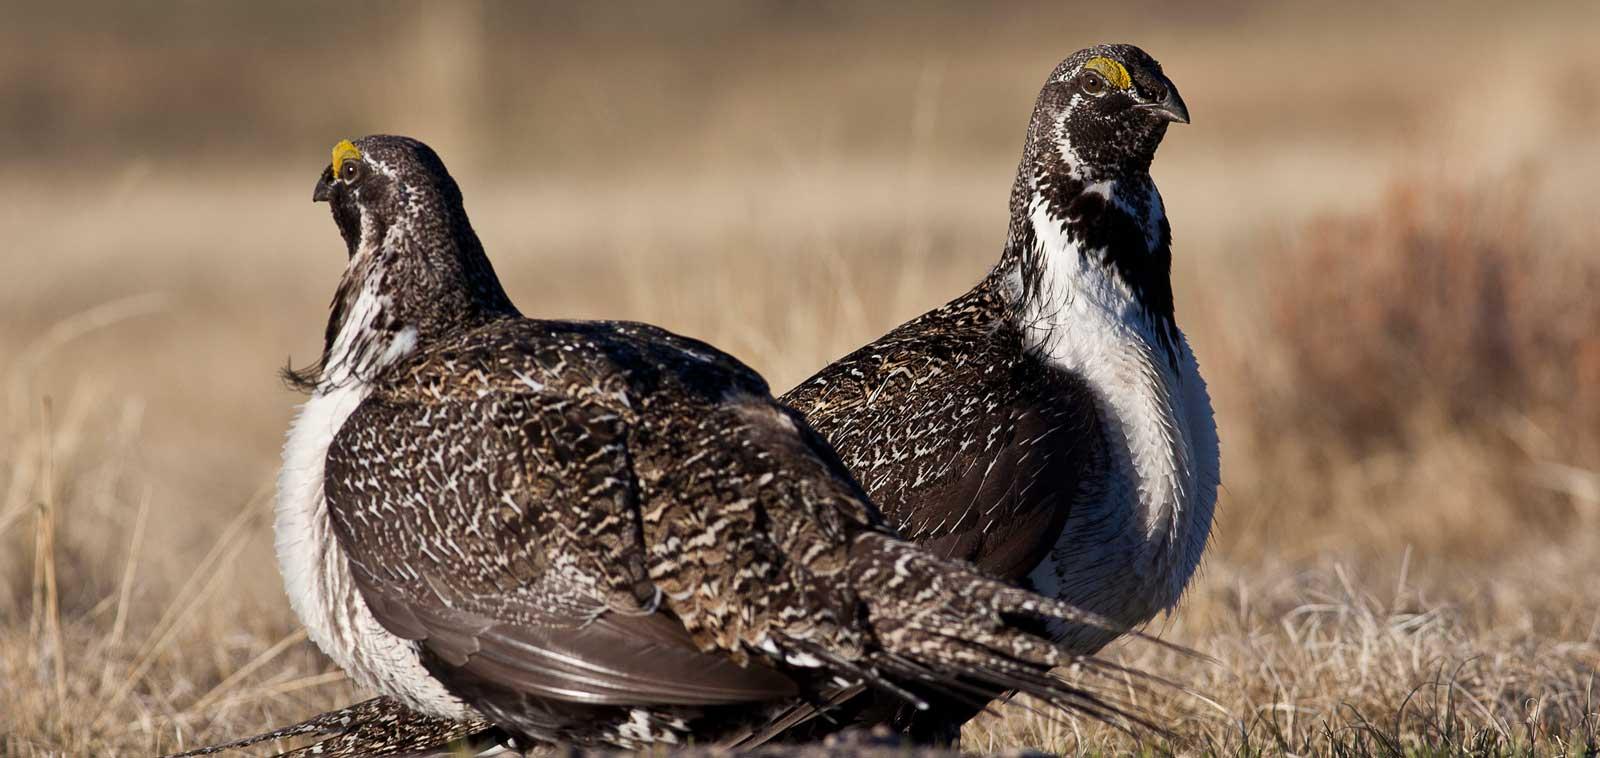 Sage-grouse photo by Bureau of Land Management California via Flickr